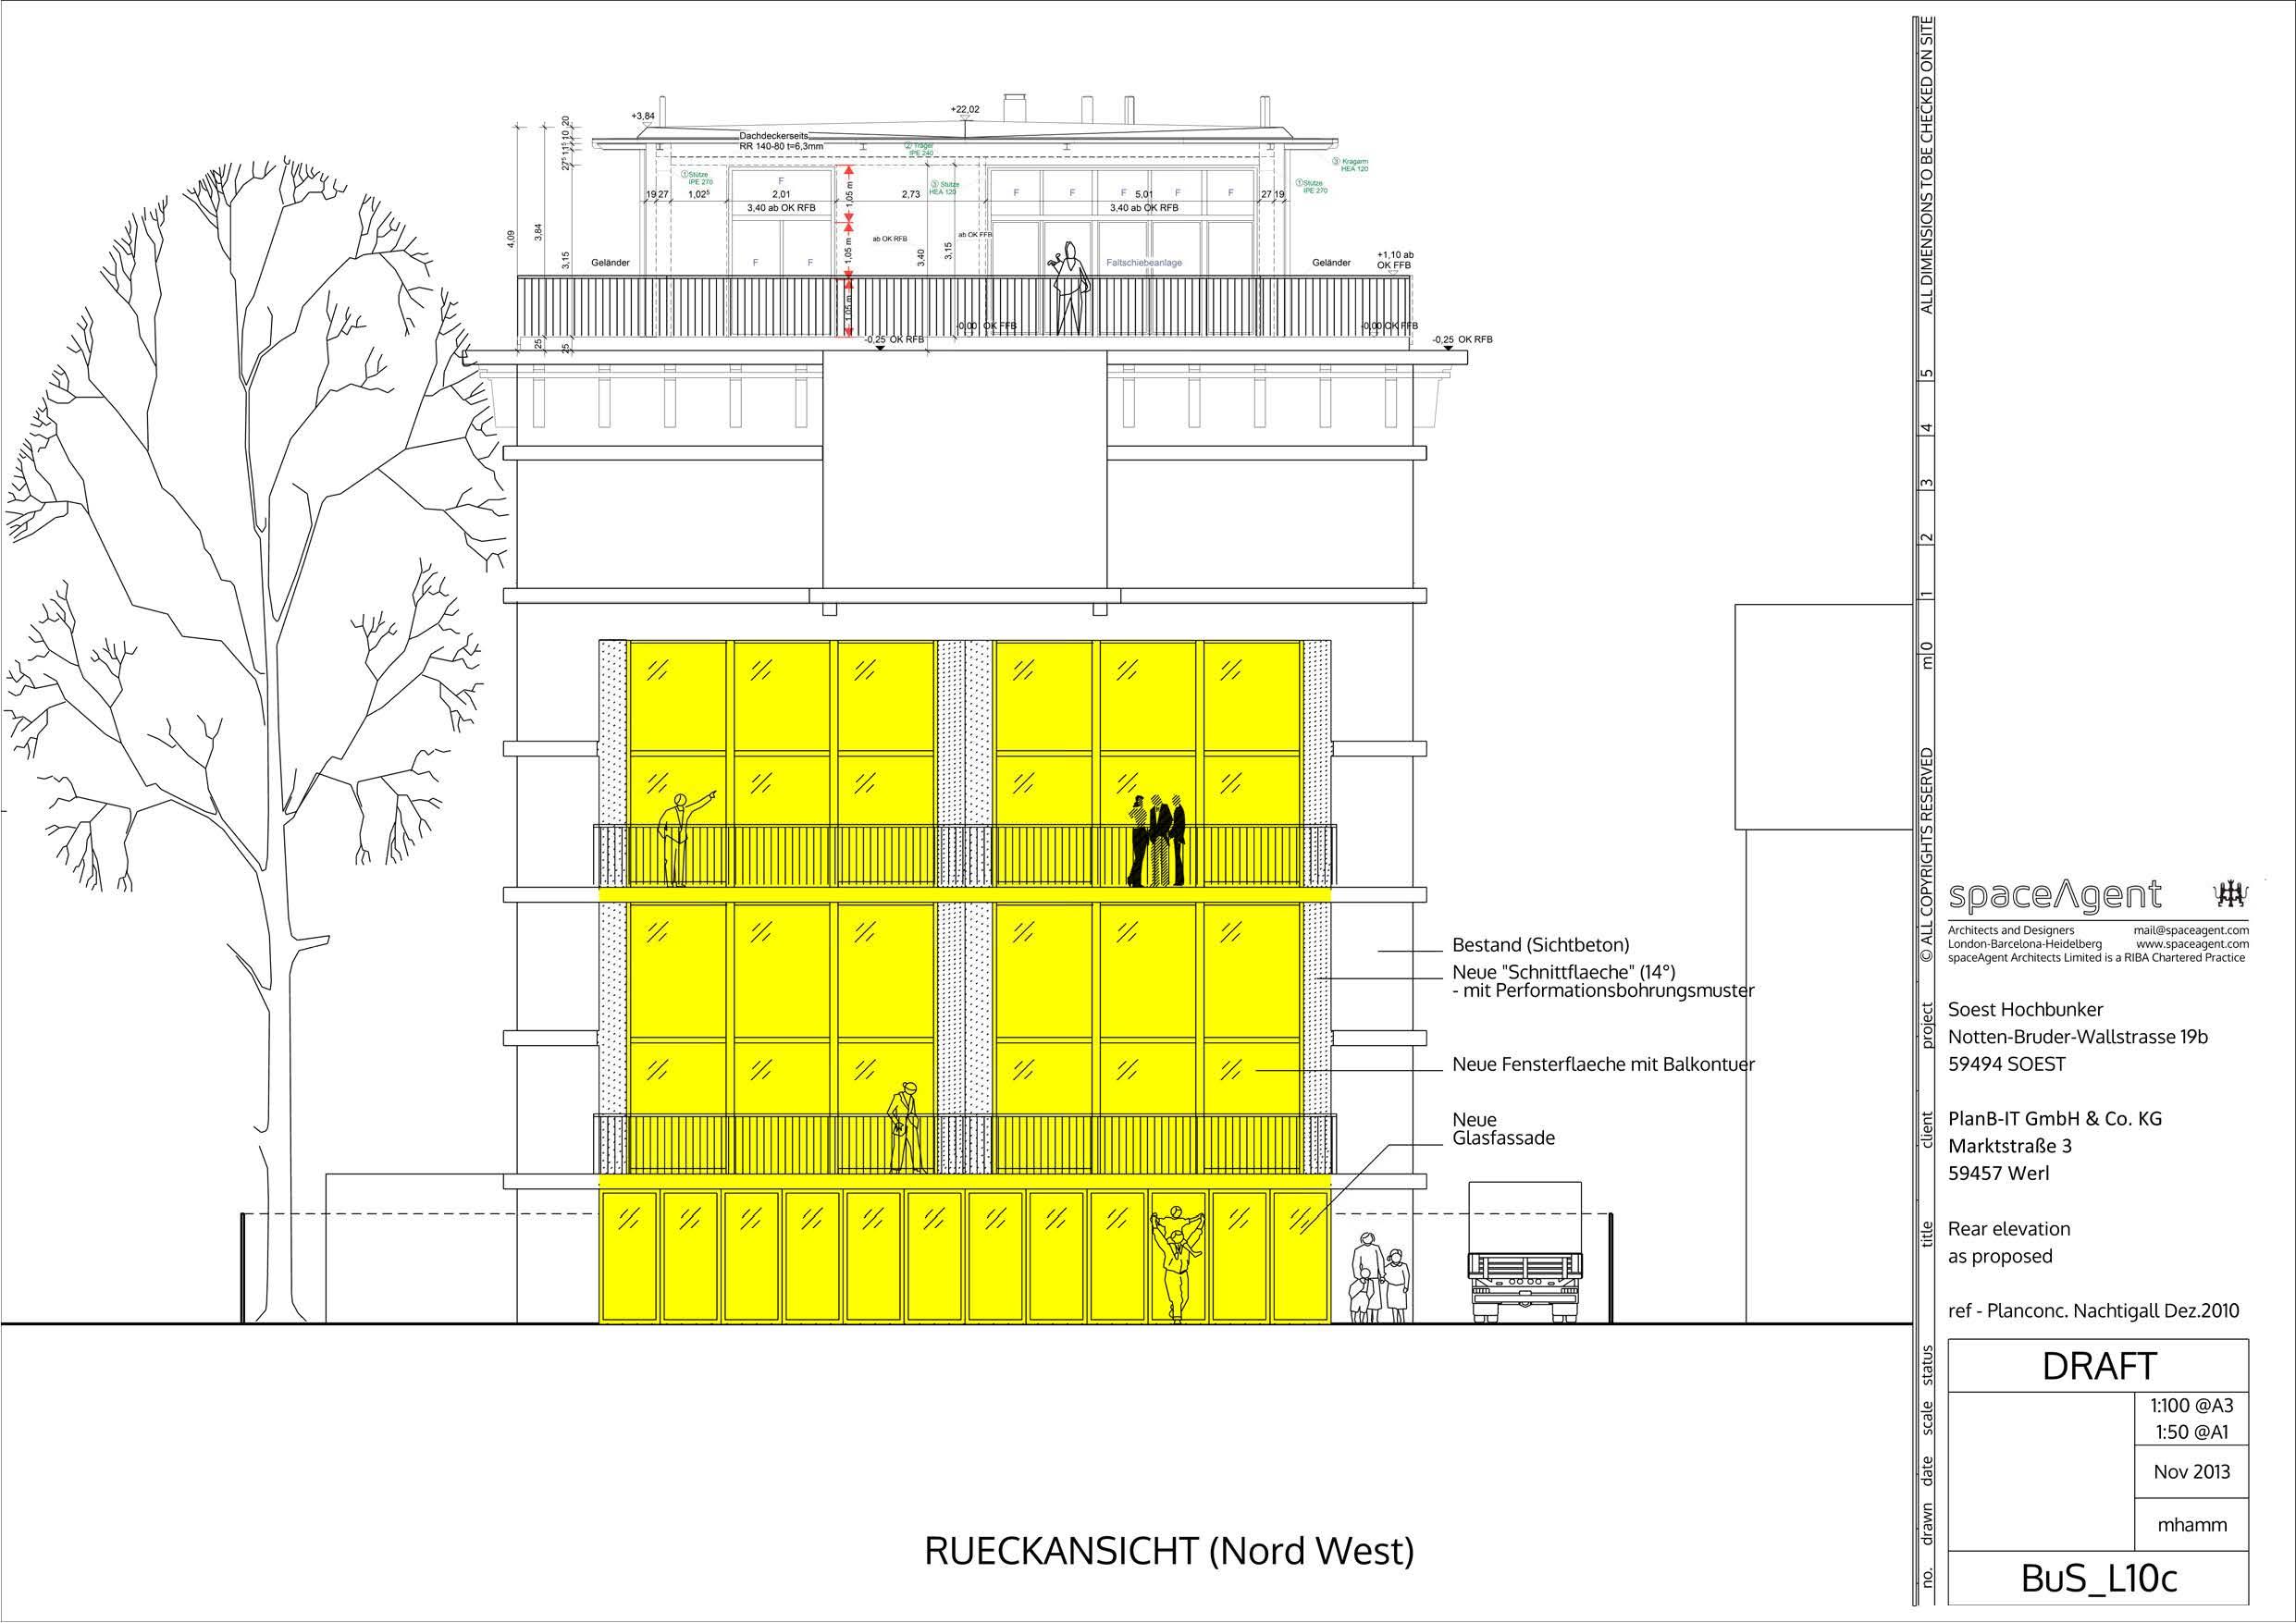 BuS_L revC - DRAFT fuer Gestaltungsbeirat 10.12.2013_Page_5